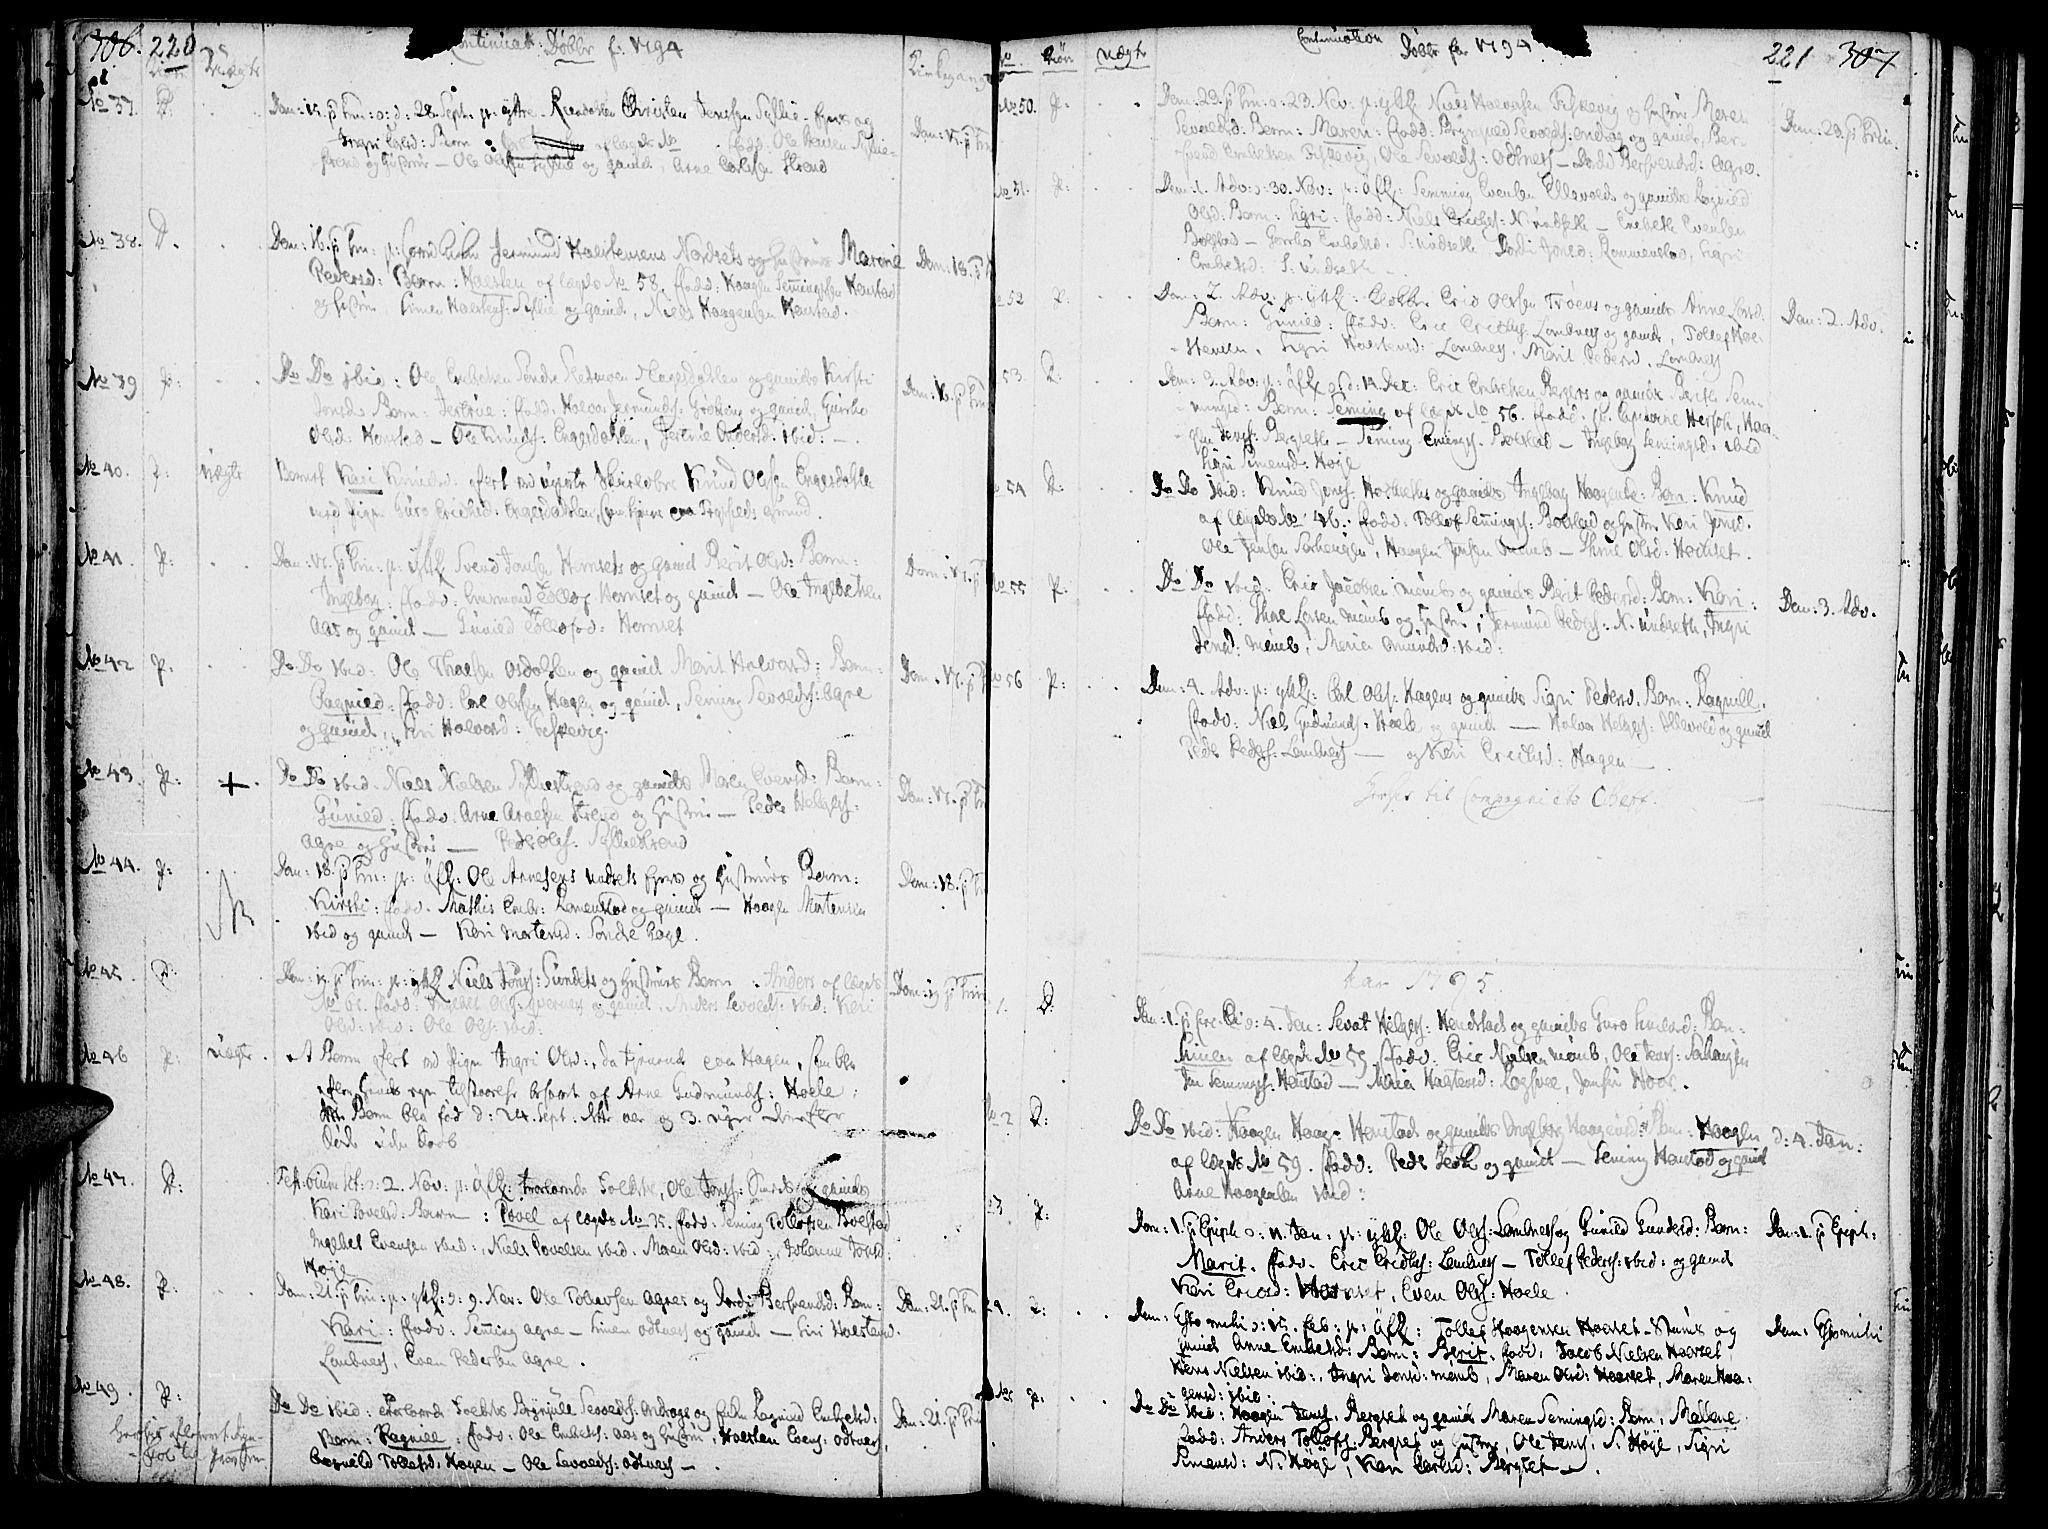 SAH, Rendalen prestekontor, H/Ha/Haa/L0002: Ministerialbok nr. 2, 1788-1814, s. 220-221